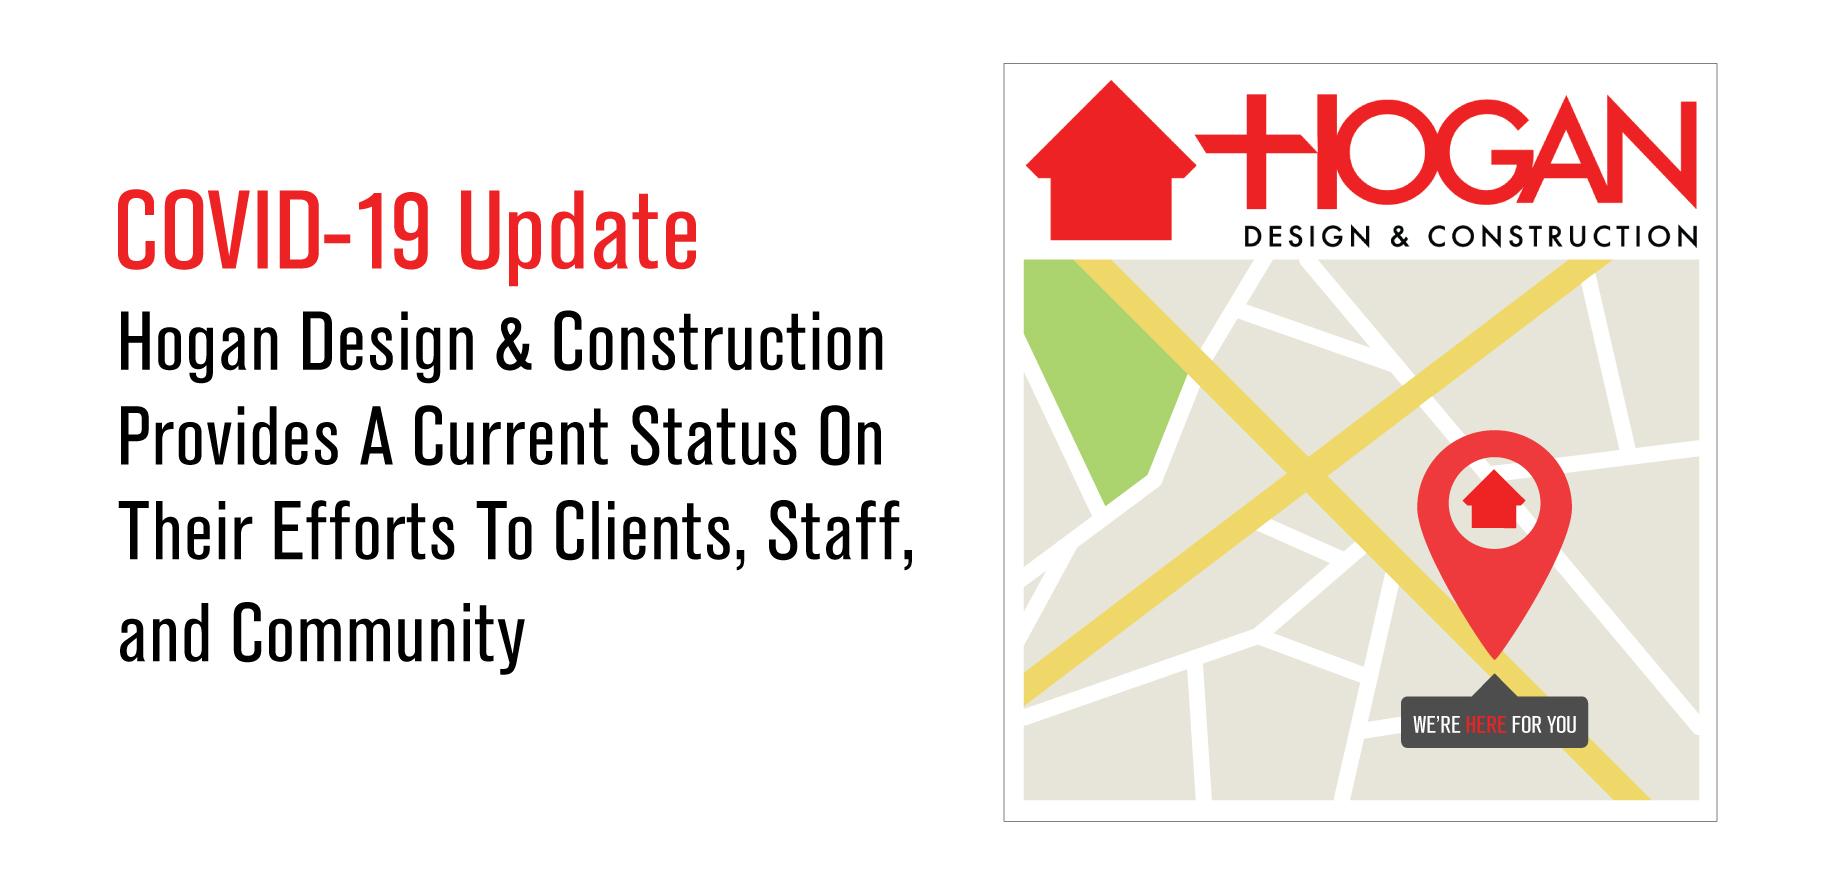 Hogan Design & Construction COVID-19 Update